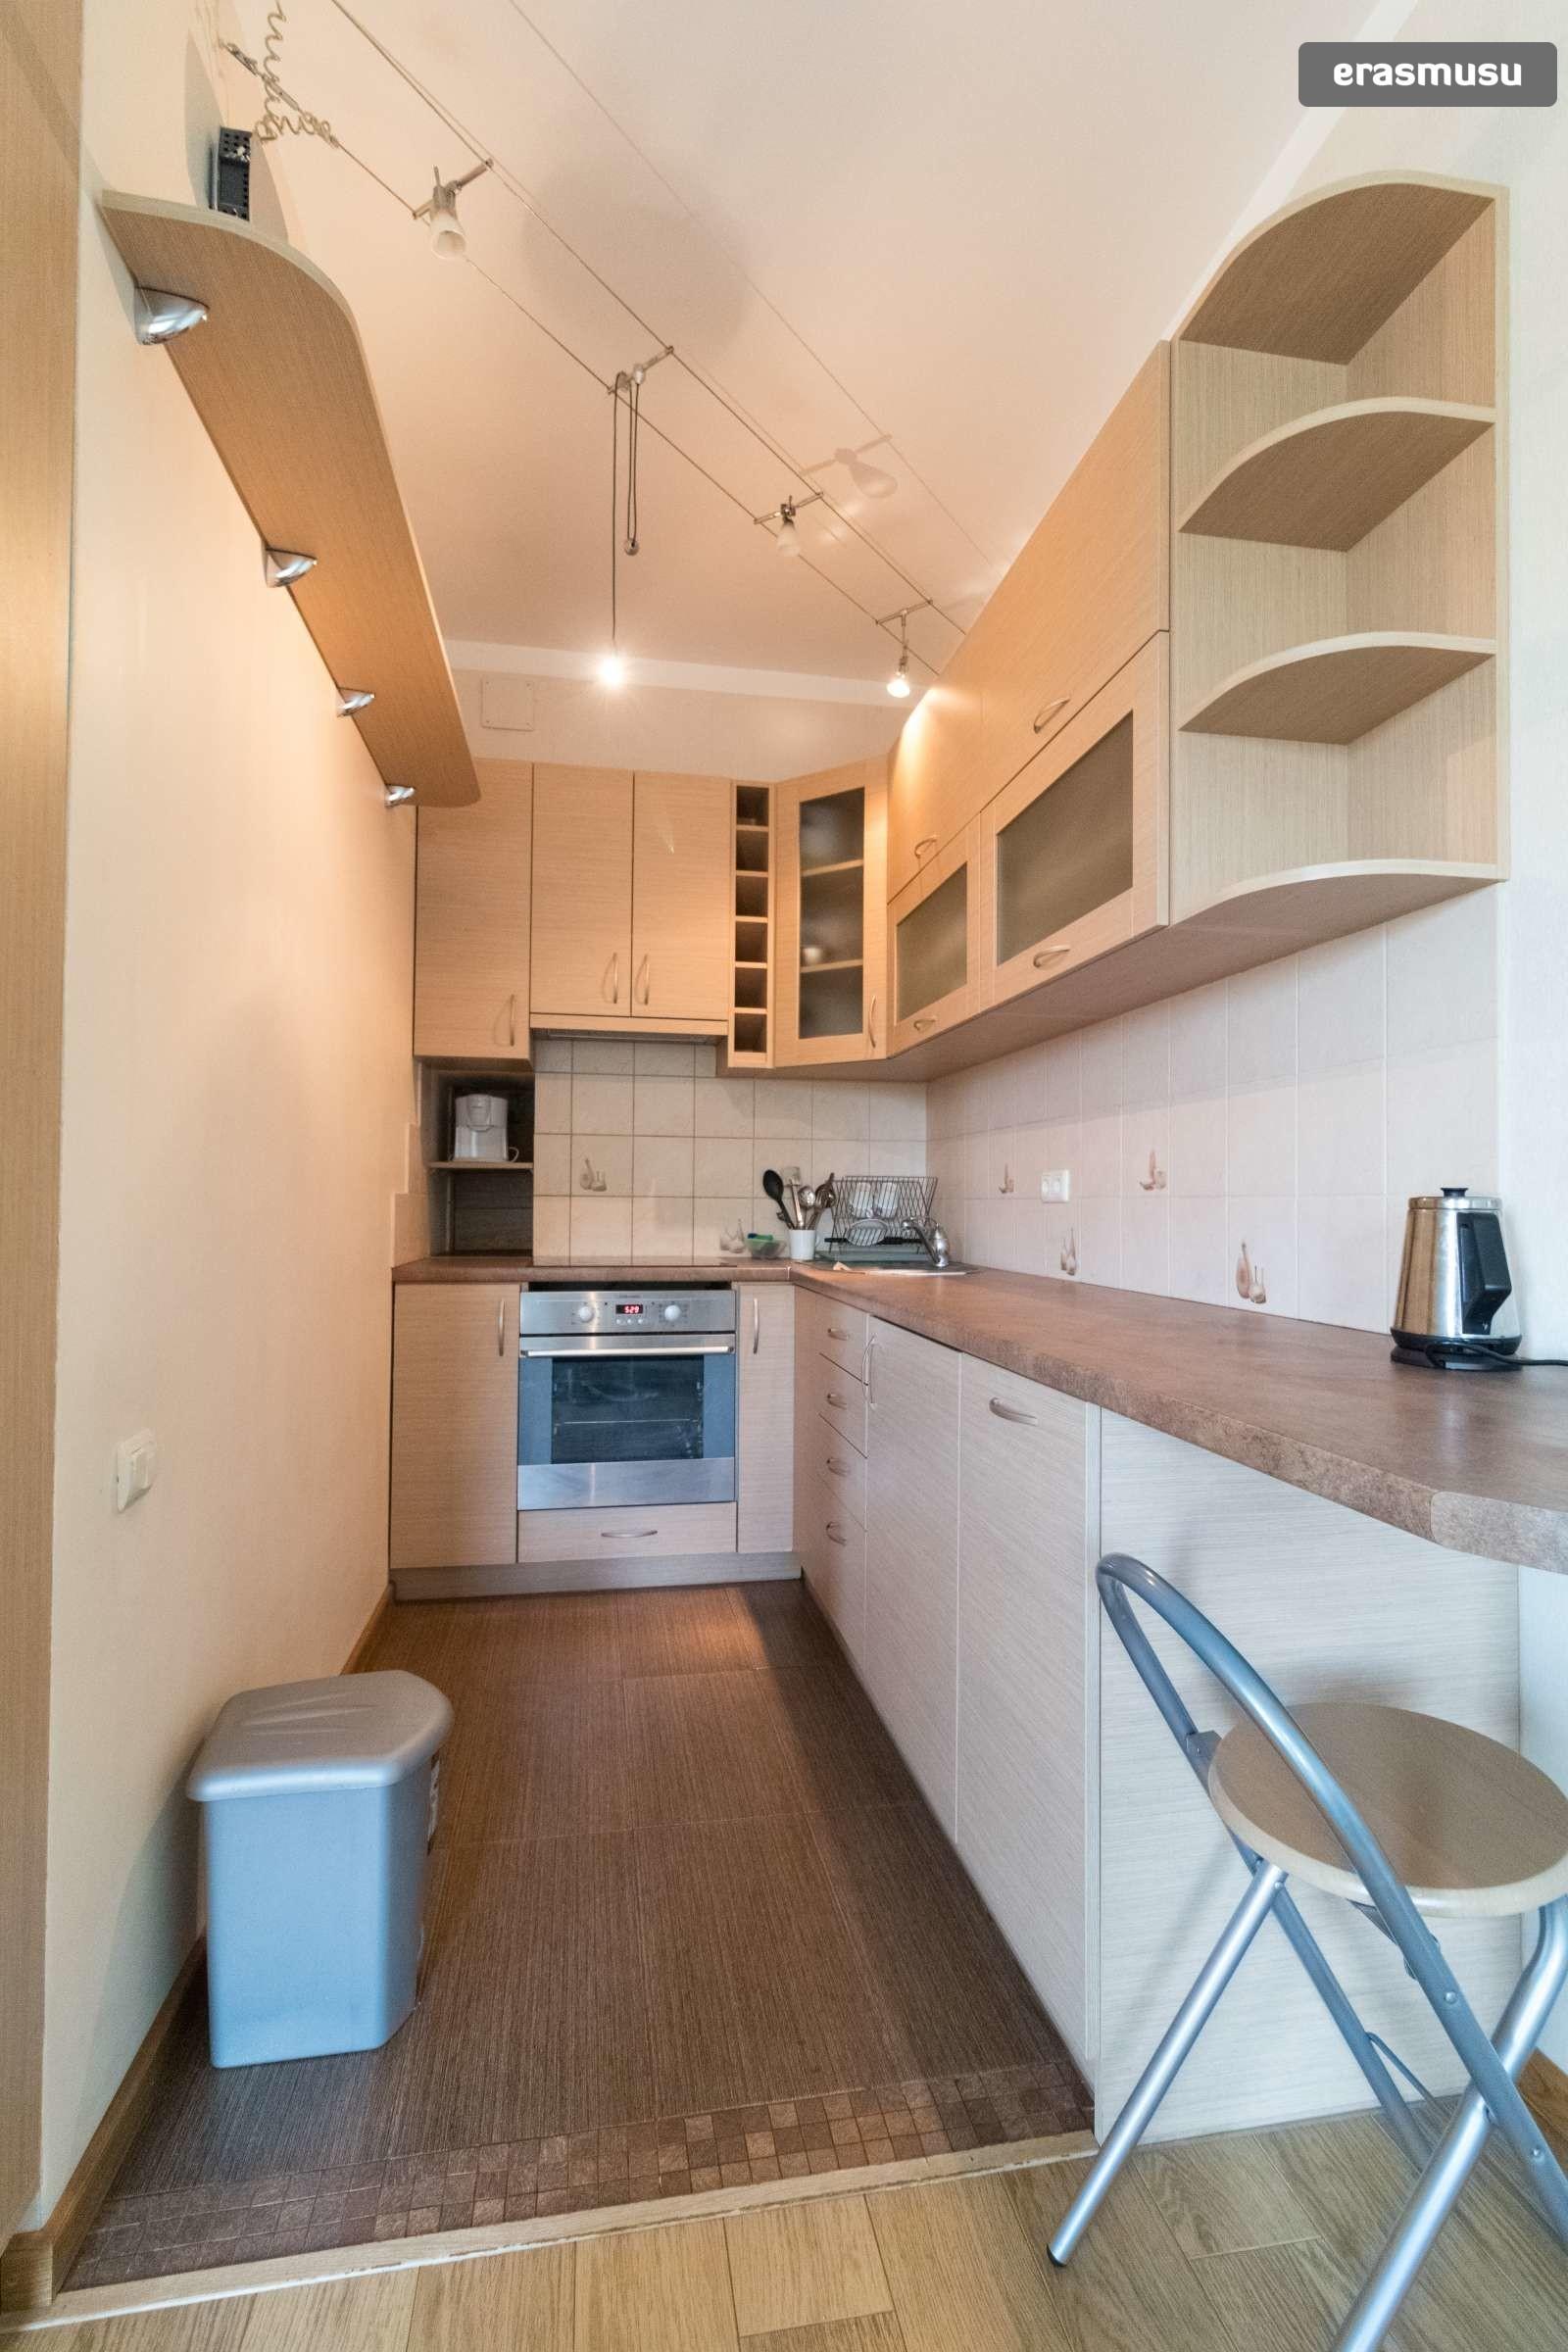 stylish-1-bedroom-apartment-balcony-rent-zasulauks-786d5c14de3a3